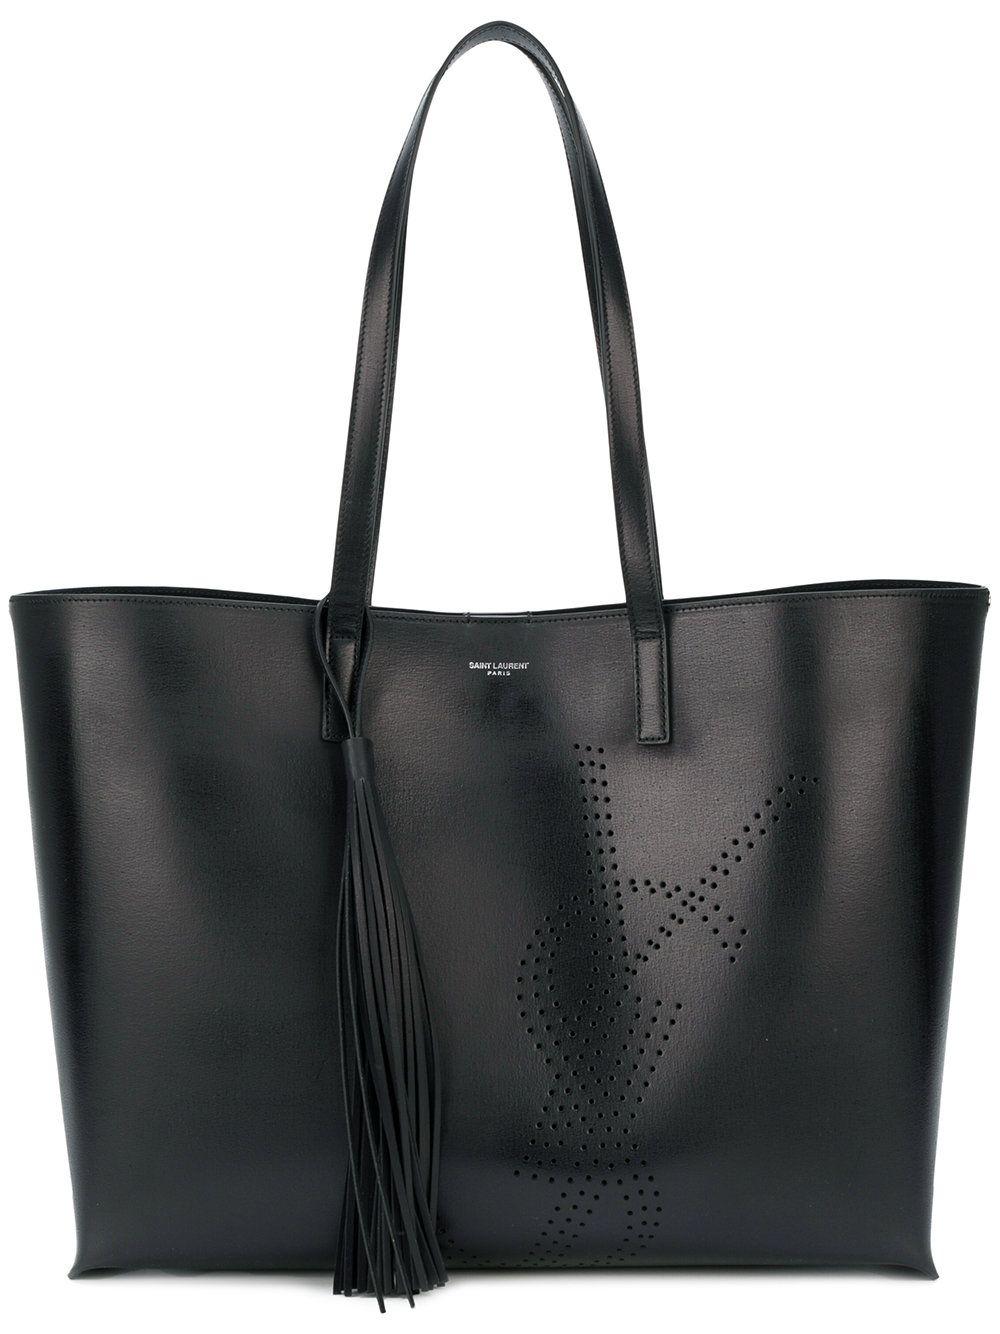 1883f80972a SAINT LAURENT . #saintlaurent #bags #leather #hand bags #tote ...